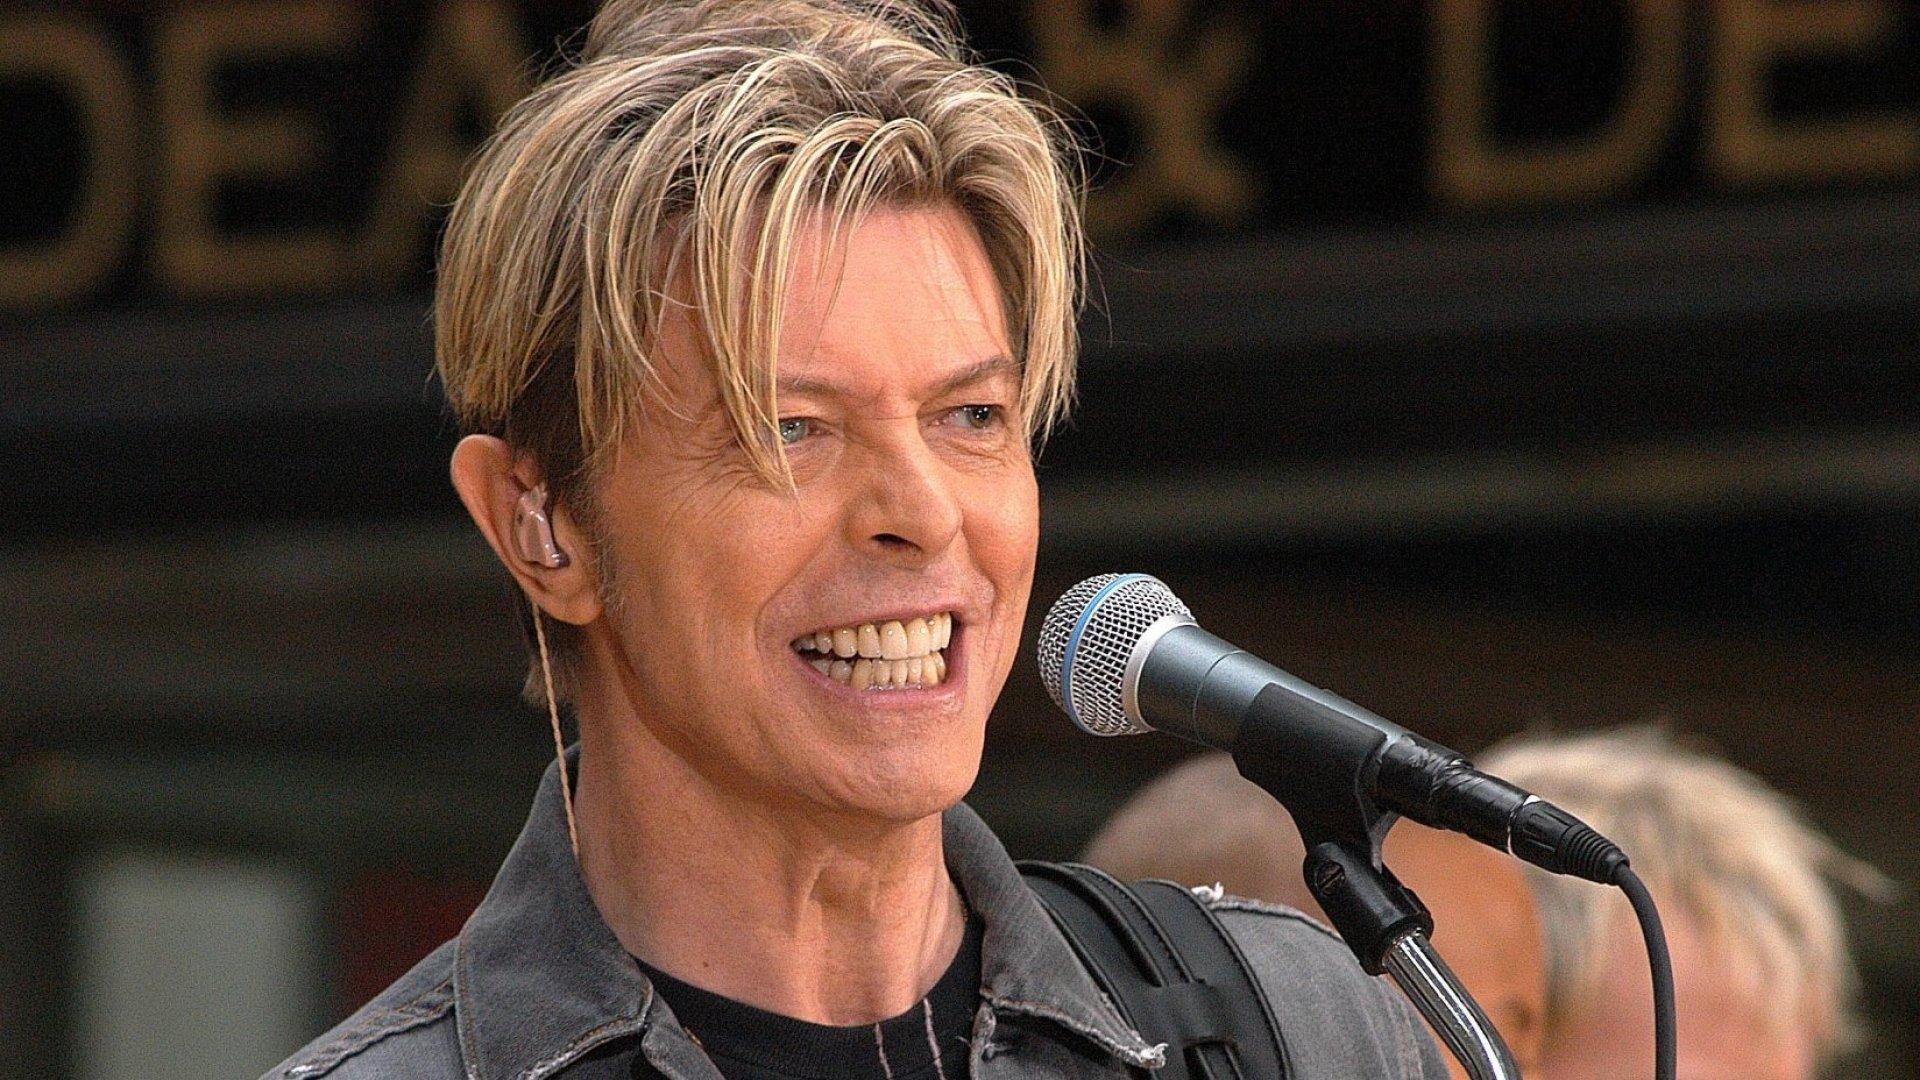 Bowie circa 2010